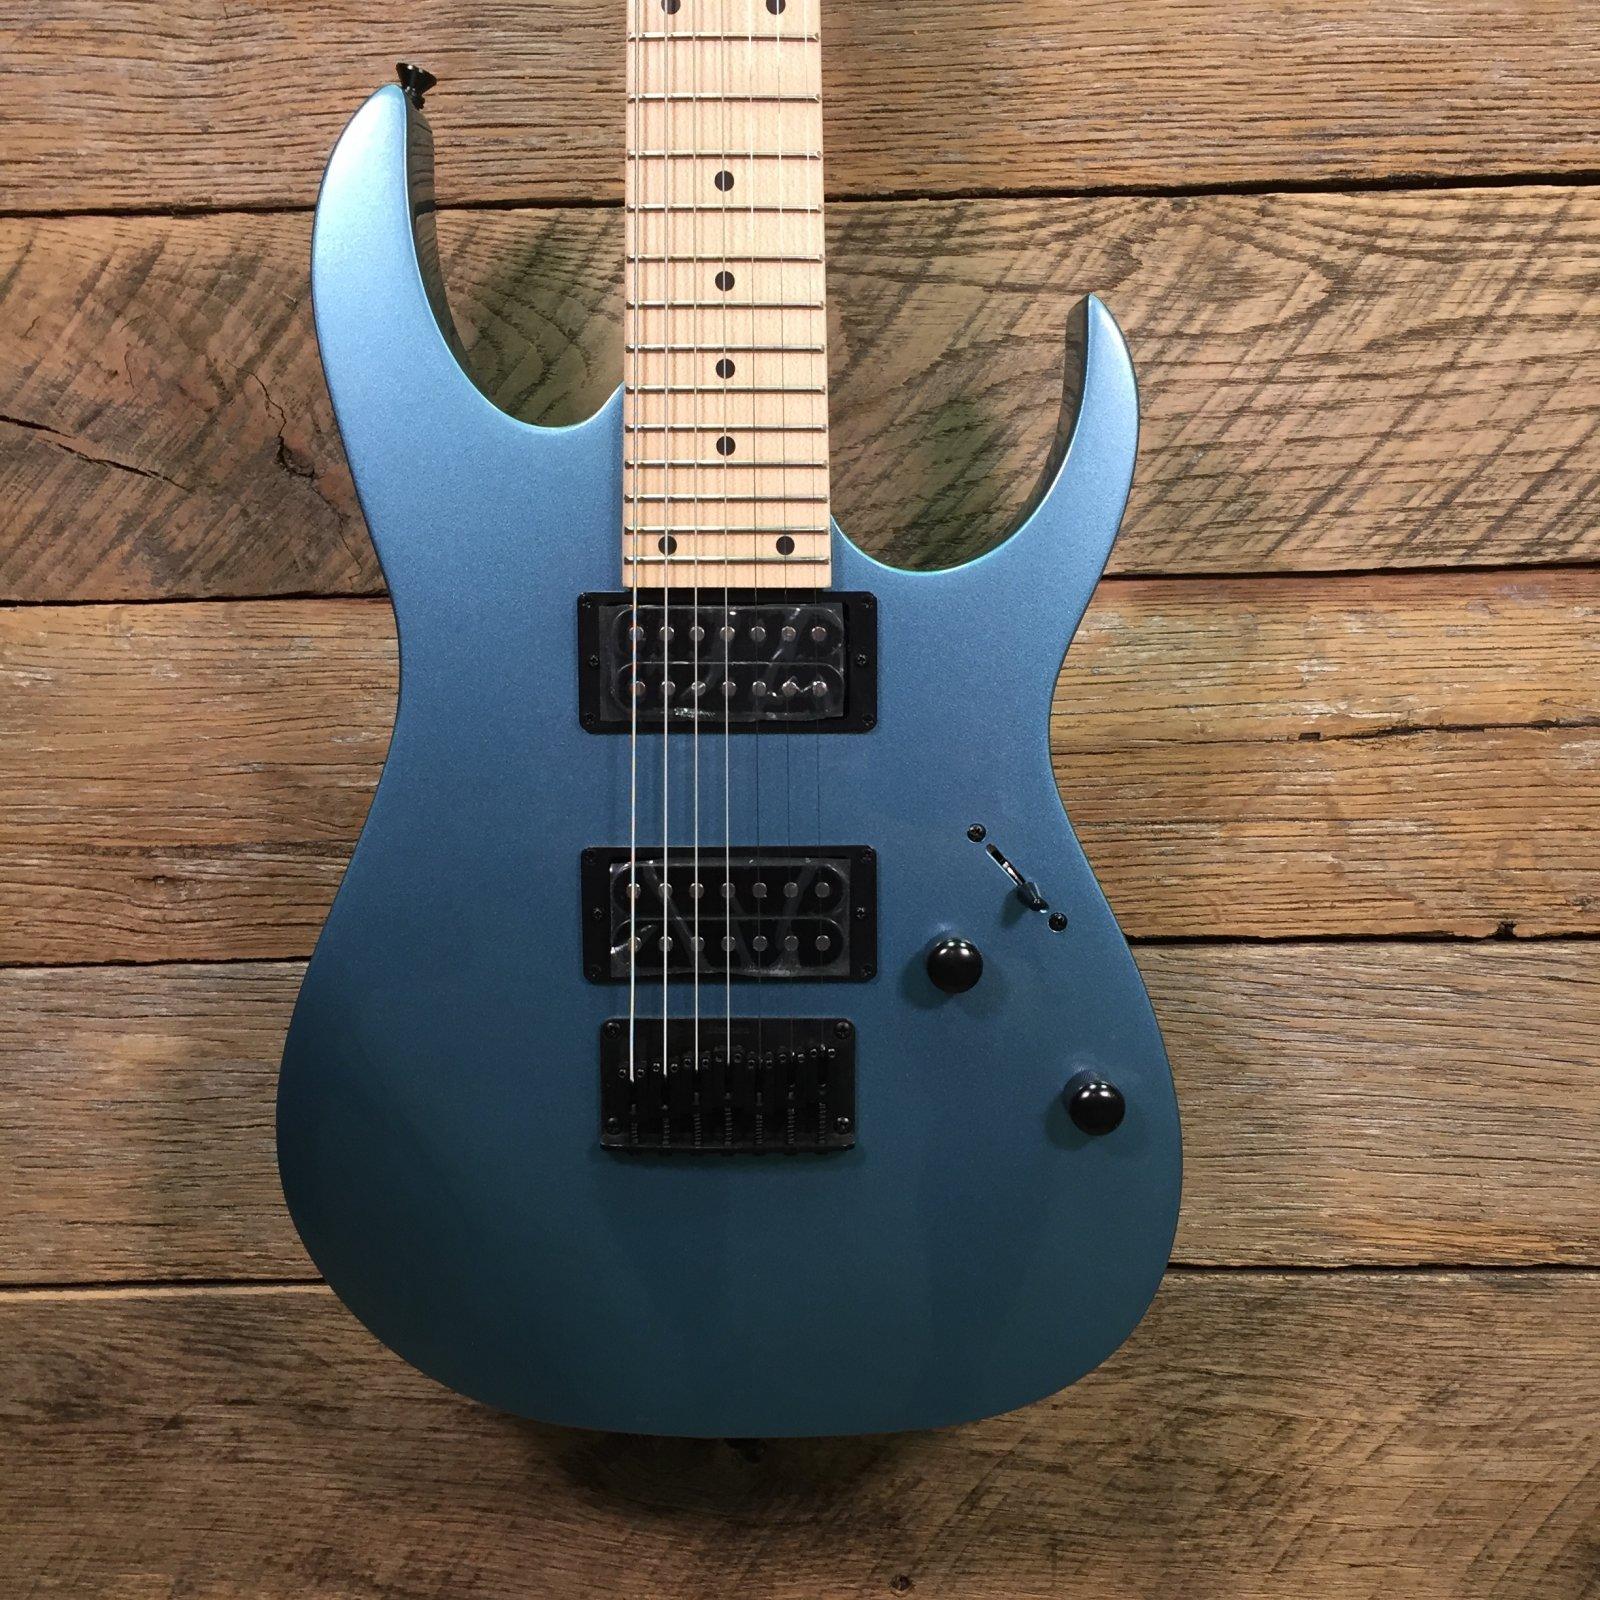 Ibanez GRG7221MMLB 7 String Guitar